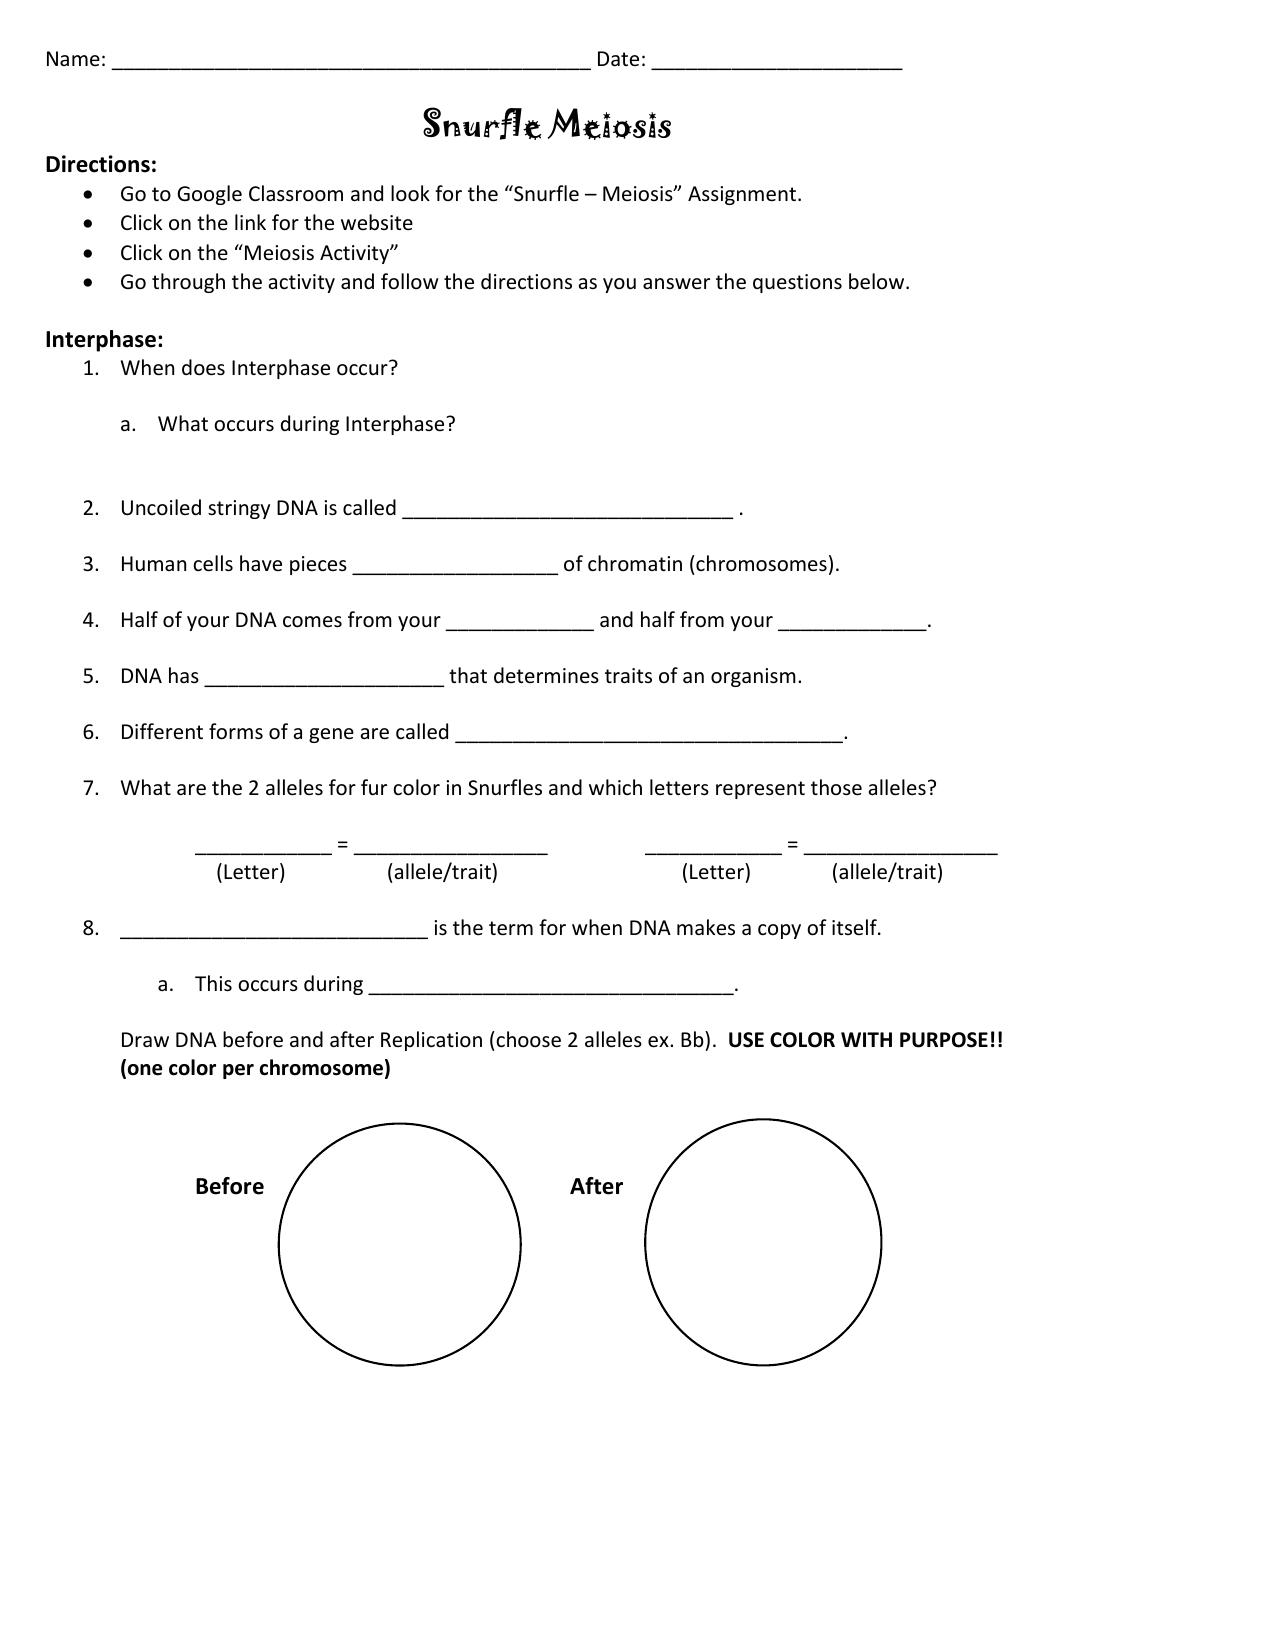 Snurfle Meiosis Worksheet - Snurfle Meiosis Worksheets ...